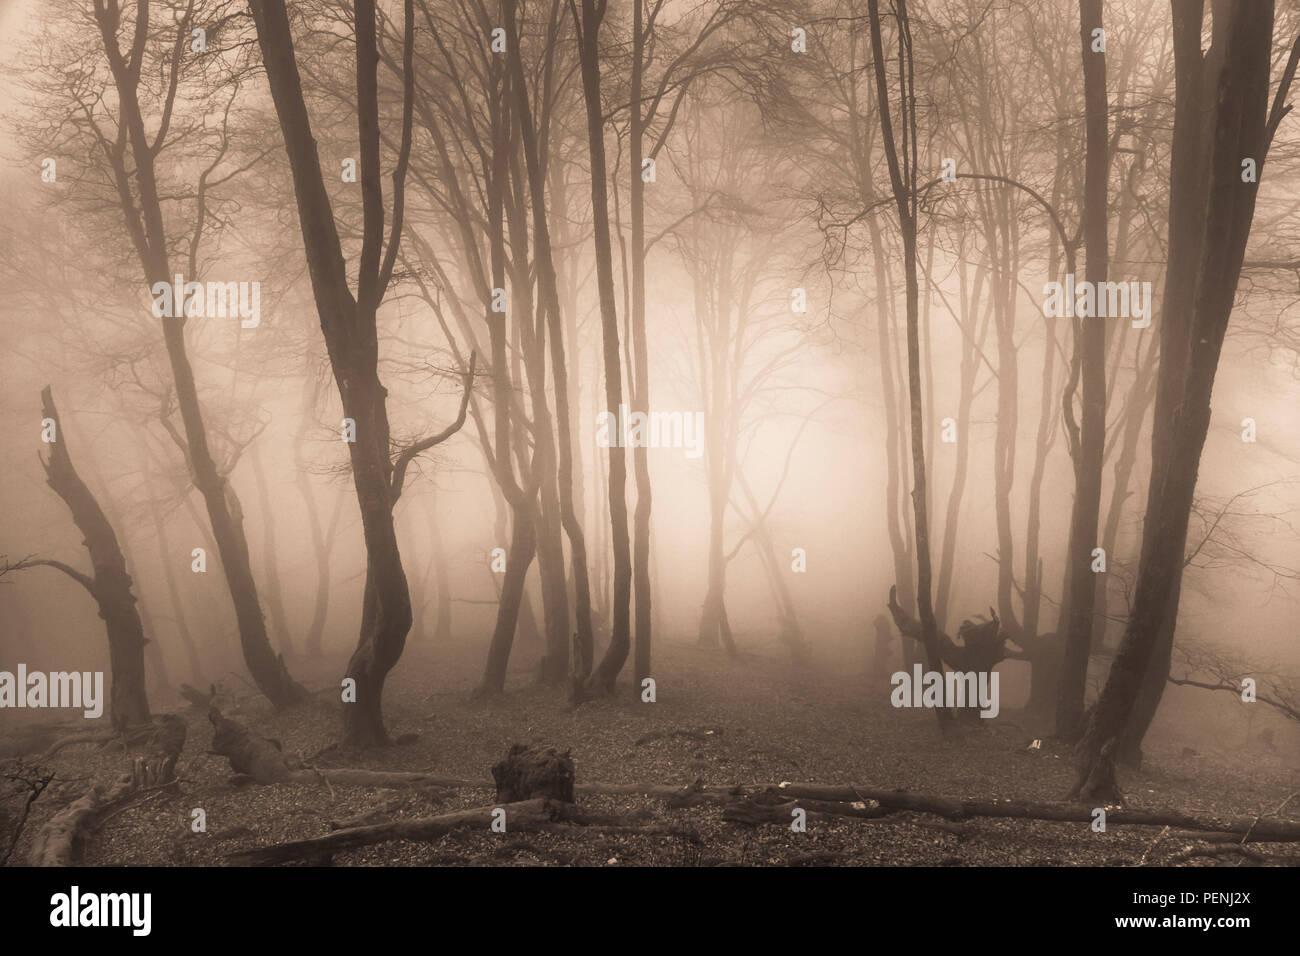 Beechwood in the mist. Stock Photo